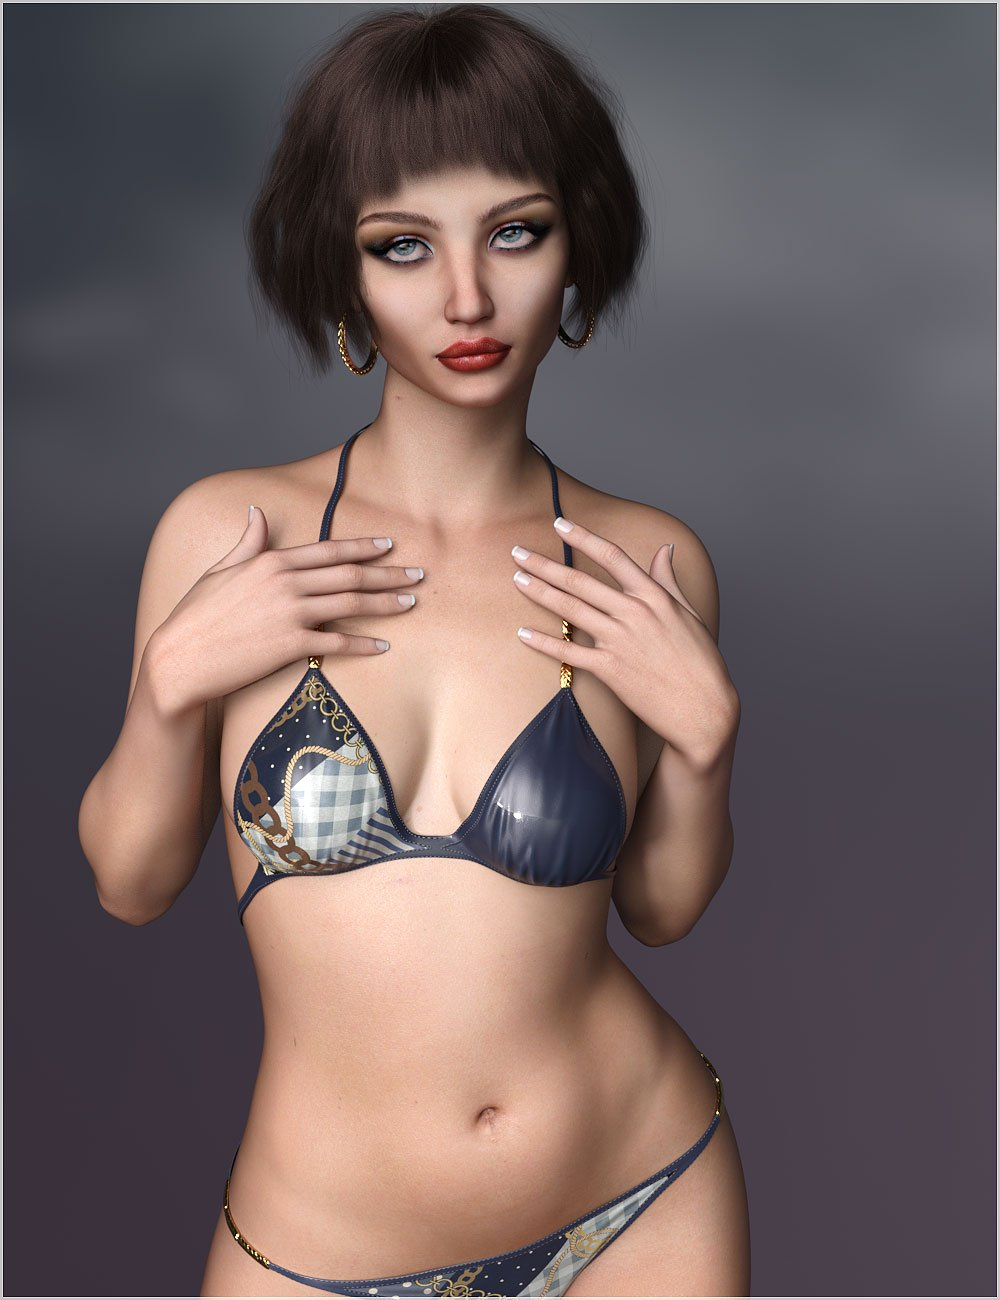 Sorcha for Bridget 8 by: Belladzines, 3D Models by Daz 3D